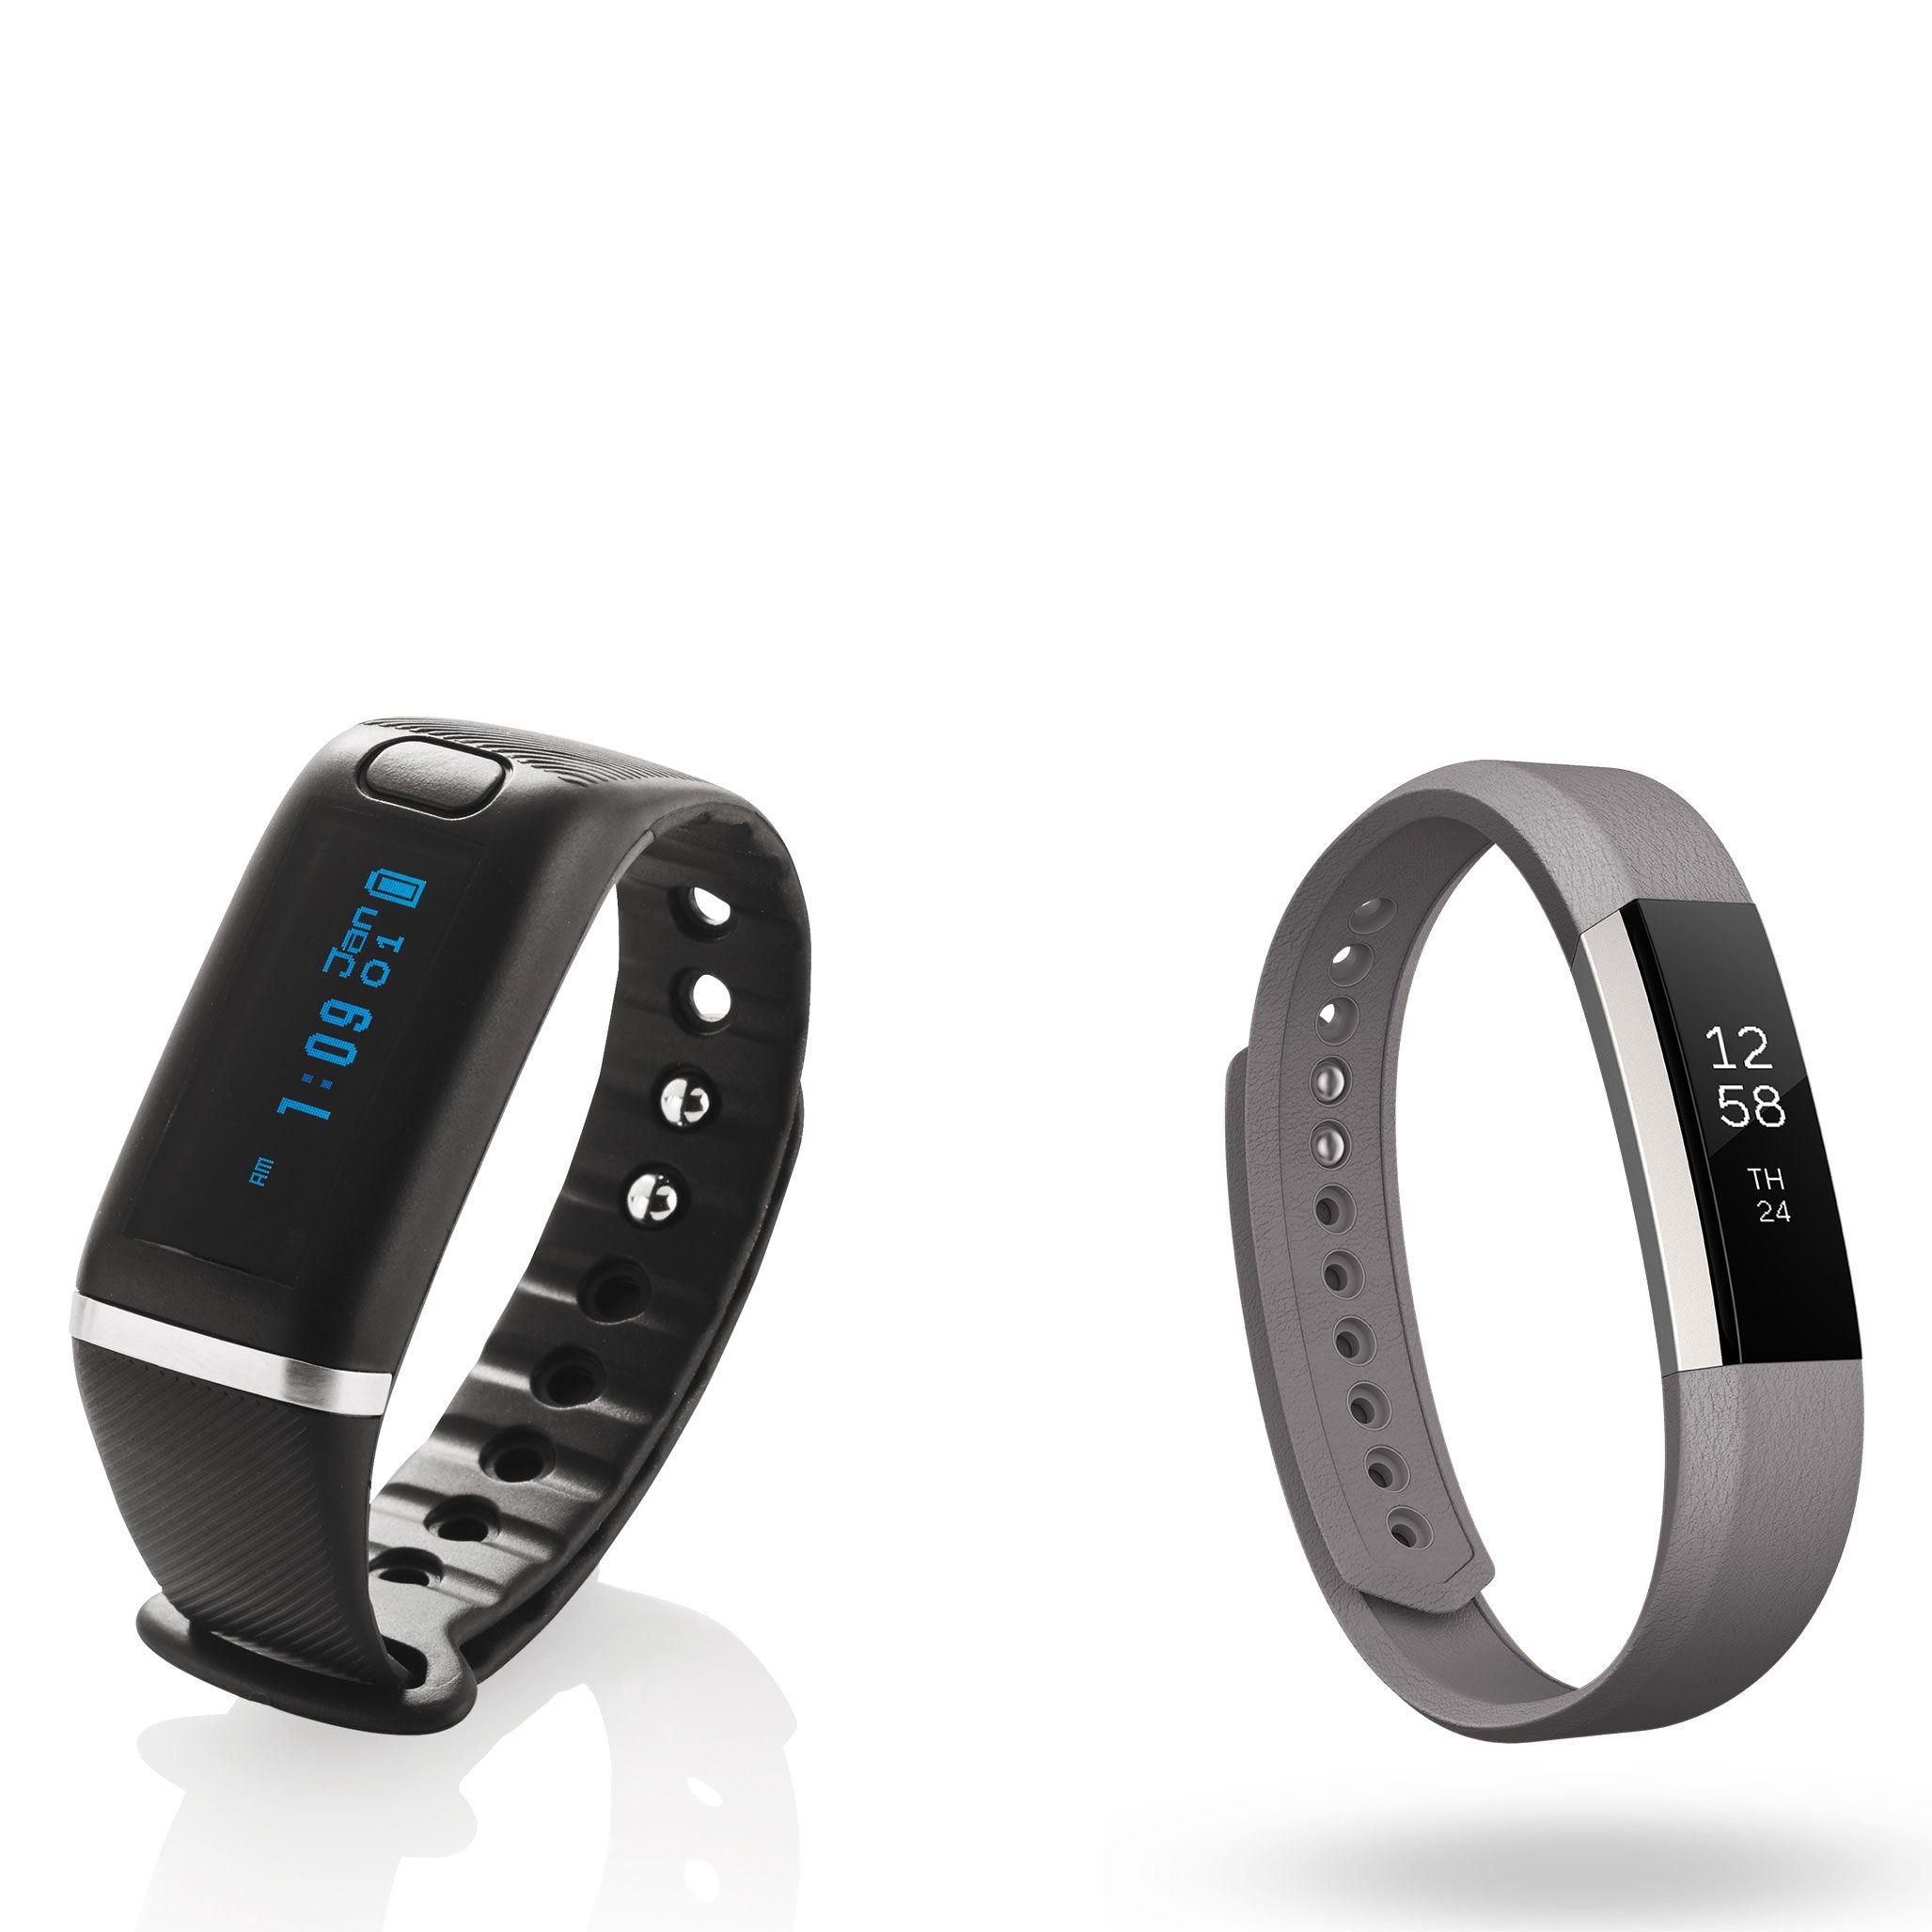 Lidl activity tracker vs Fitbit Alta - Is Lidl's activity